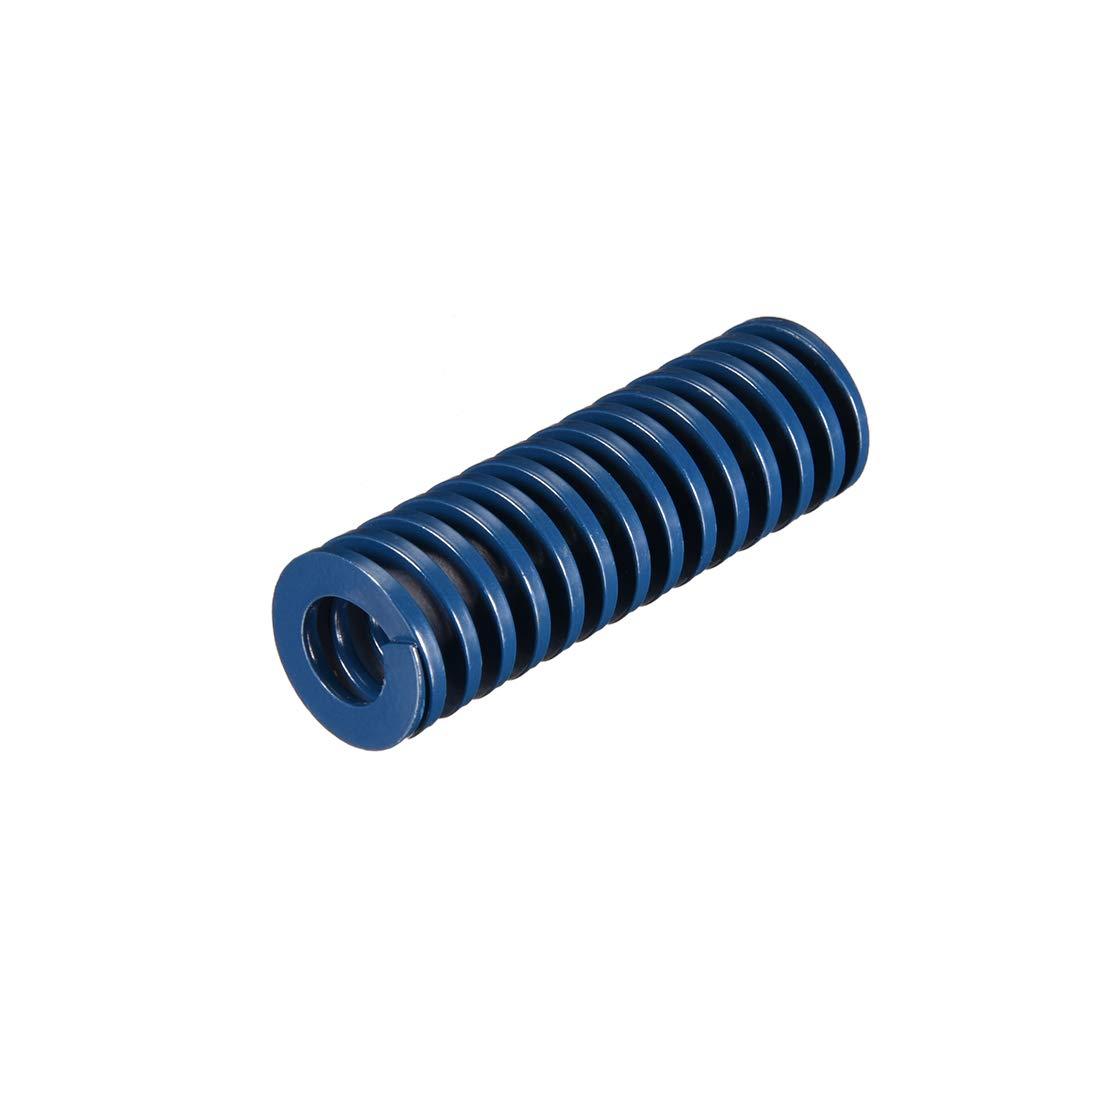 uxcell 18mm OD 55mm Long Spiral Stamping Light Load Compression Mould Die Spring Blue 1Pcs